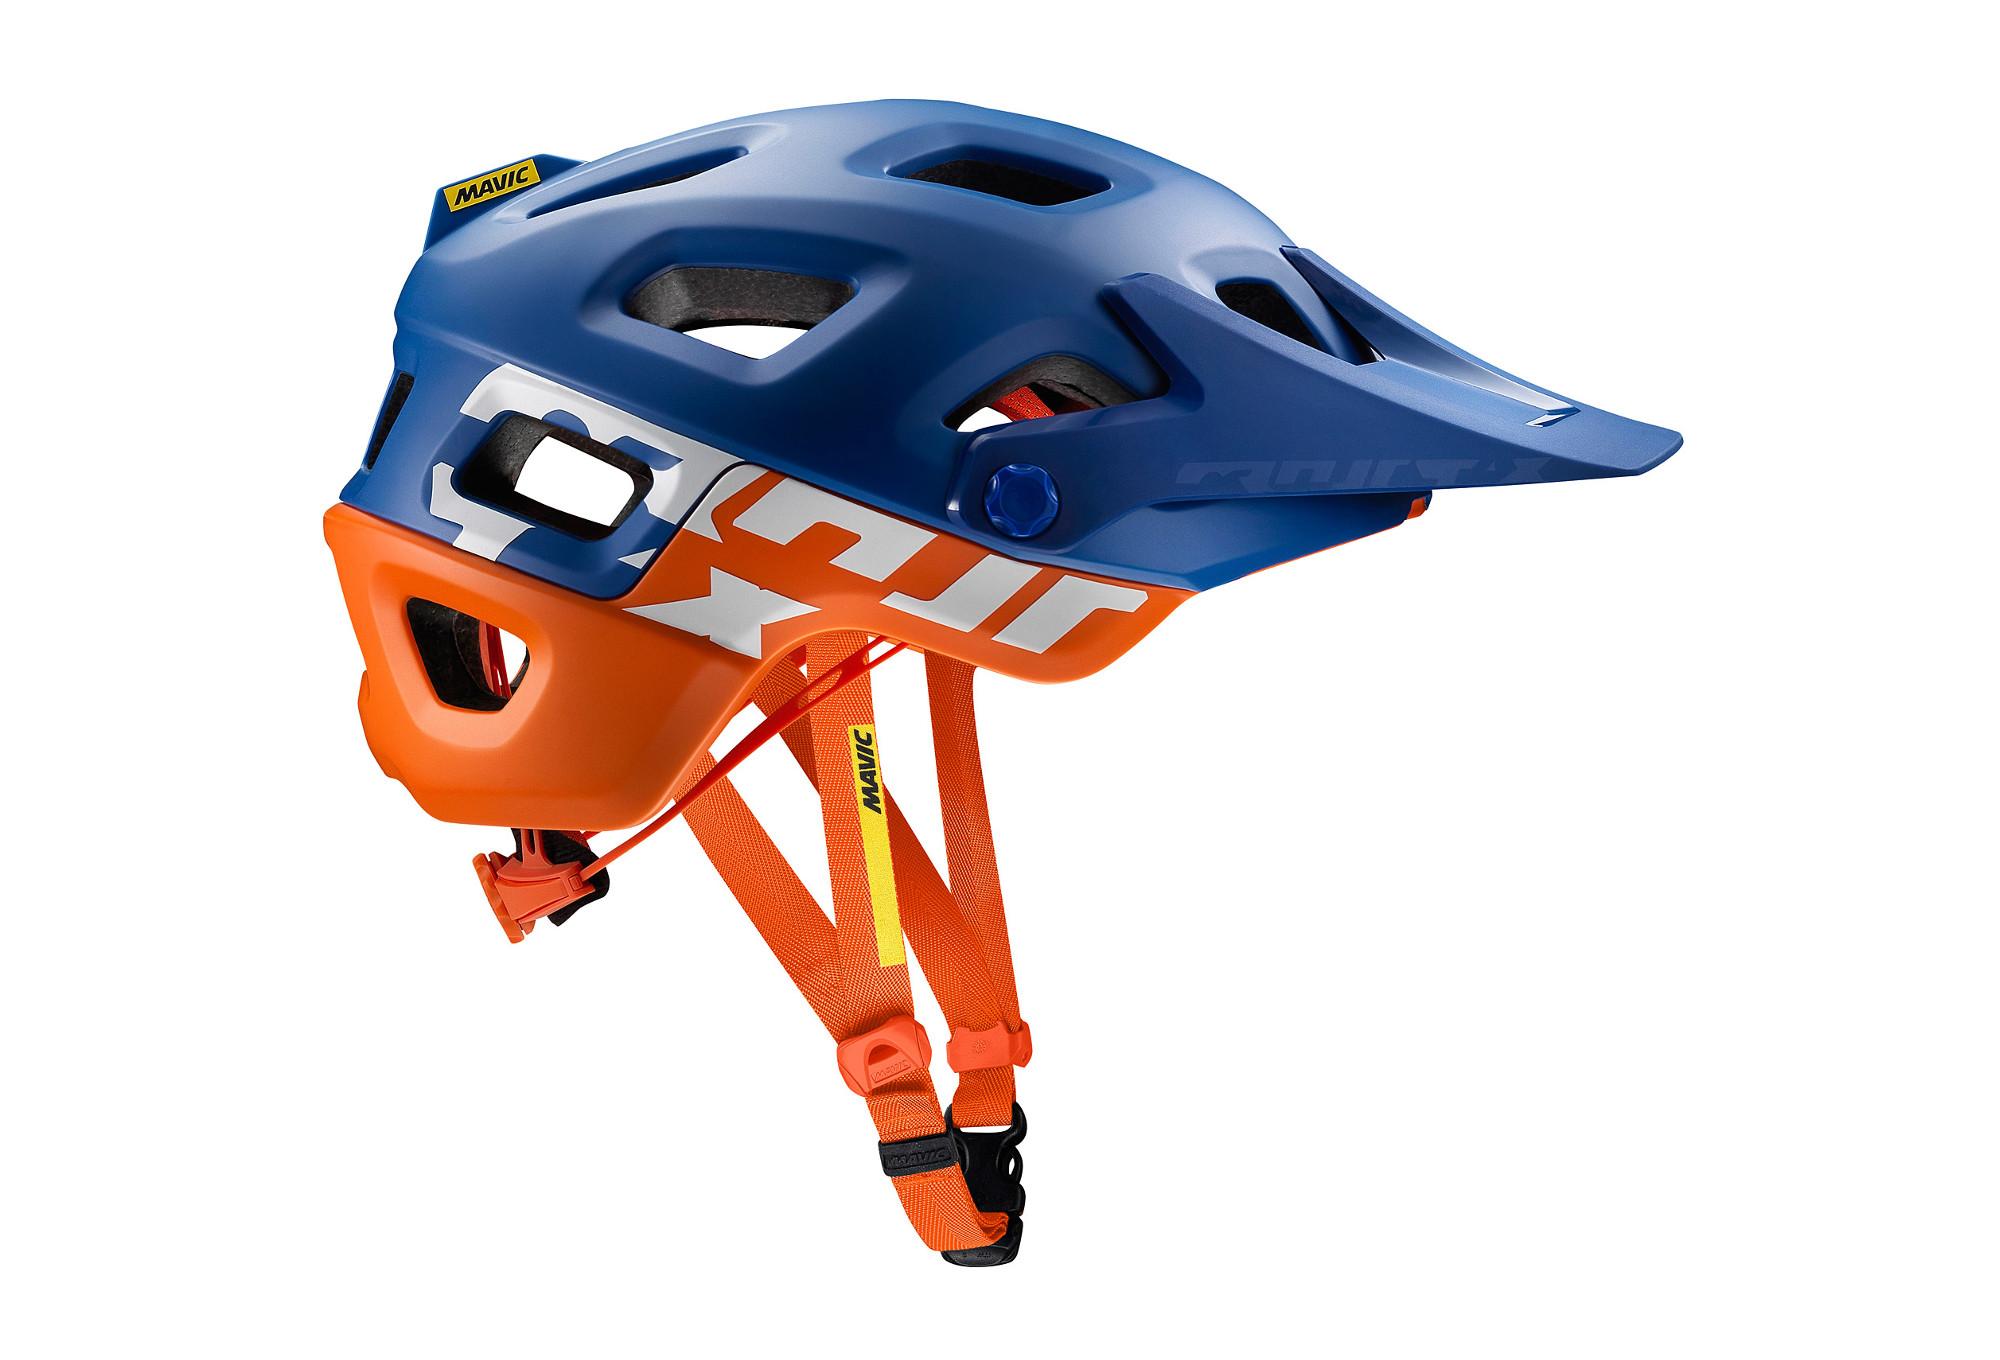 casque vtt mavic crossmax pro bleu orange. Black Bedroom Furniture Sets. Home Design Ideas